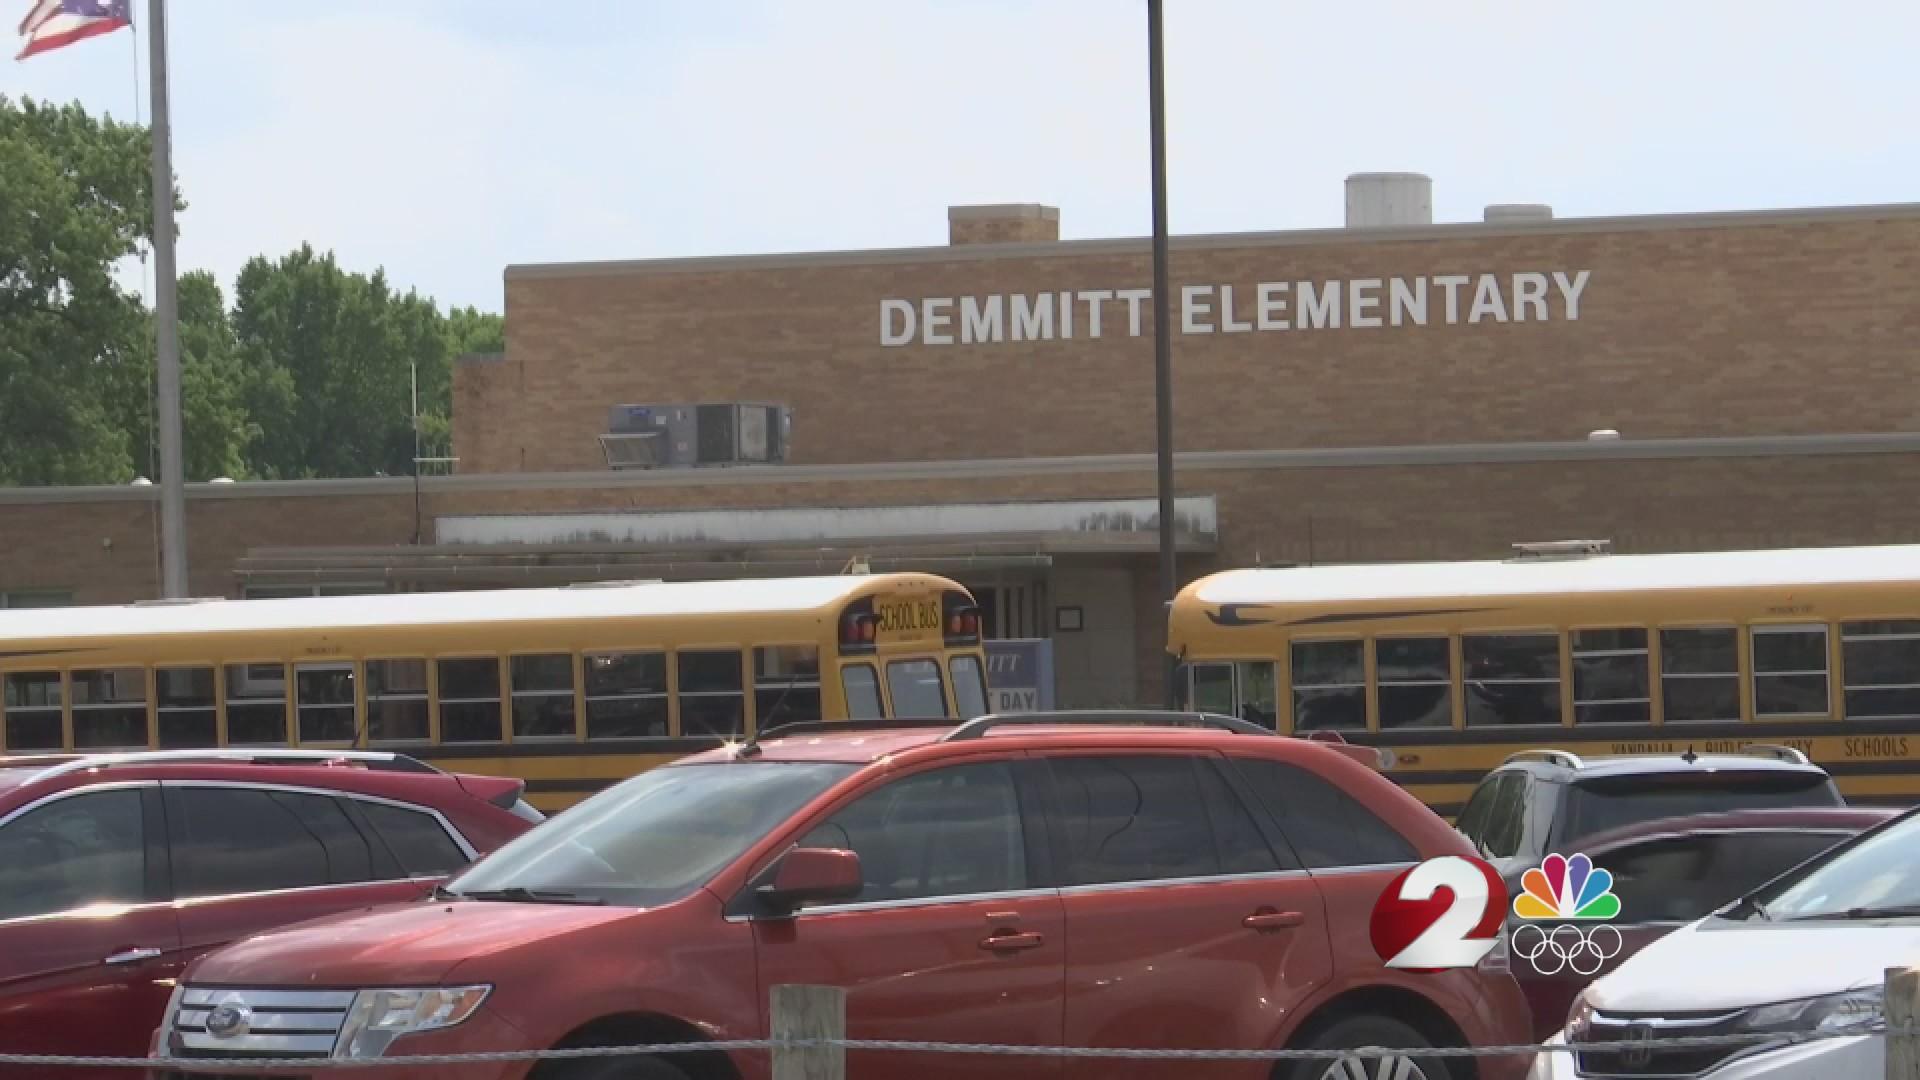 Demmitt Elementary